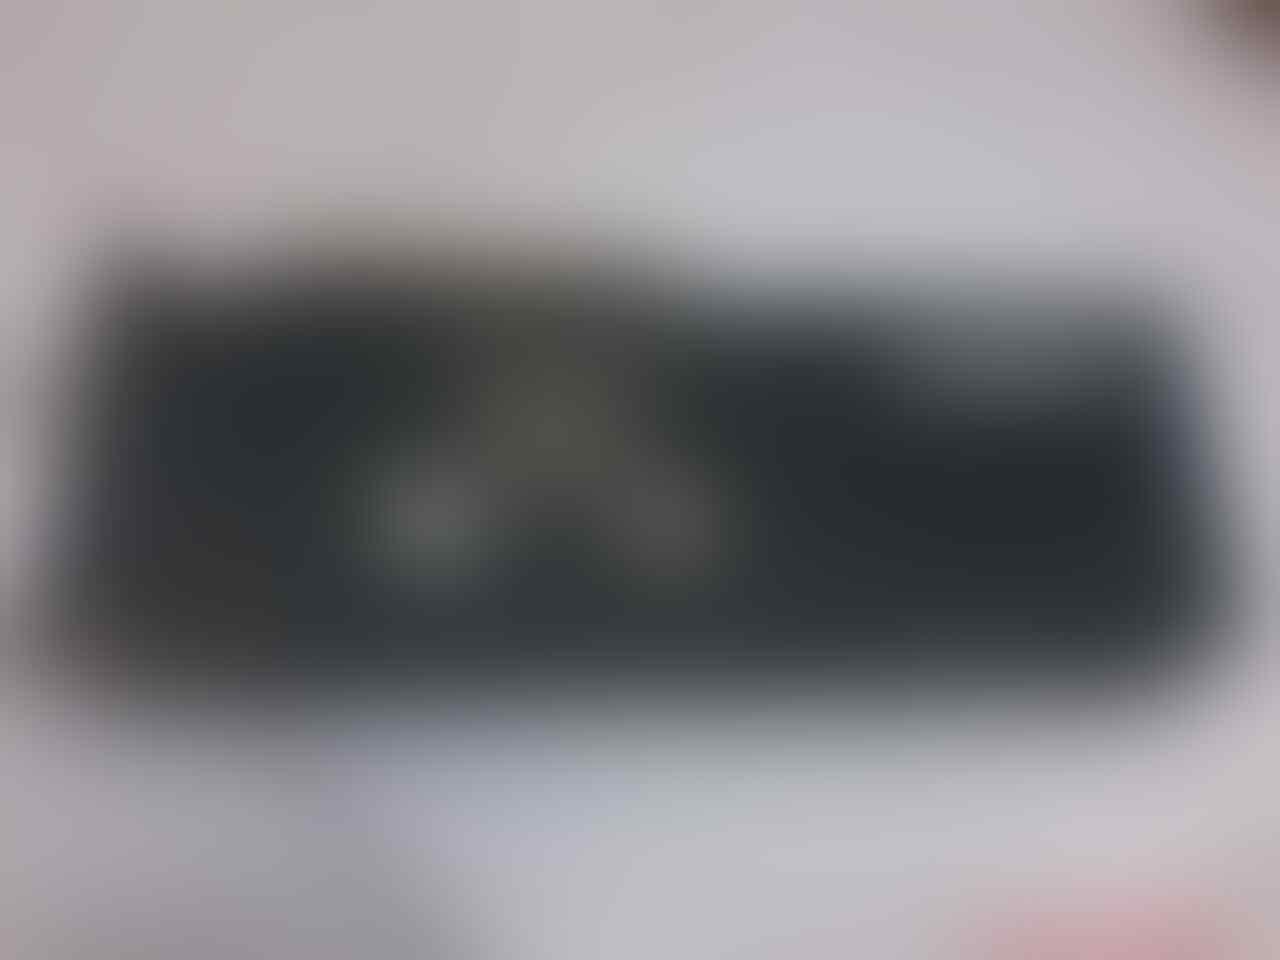 HIS HD 6950 2GB DDR5 UNLOCKED TO HD 6970 MURAH GAN !!